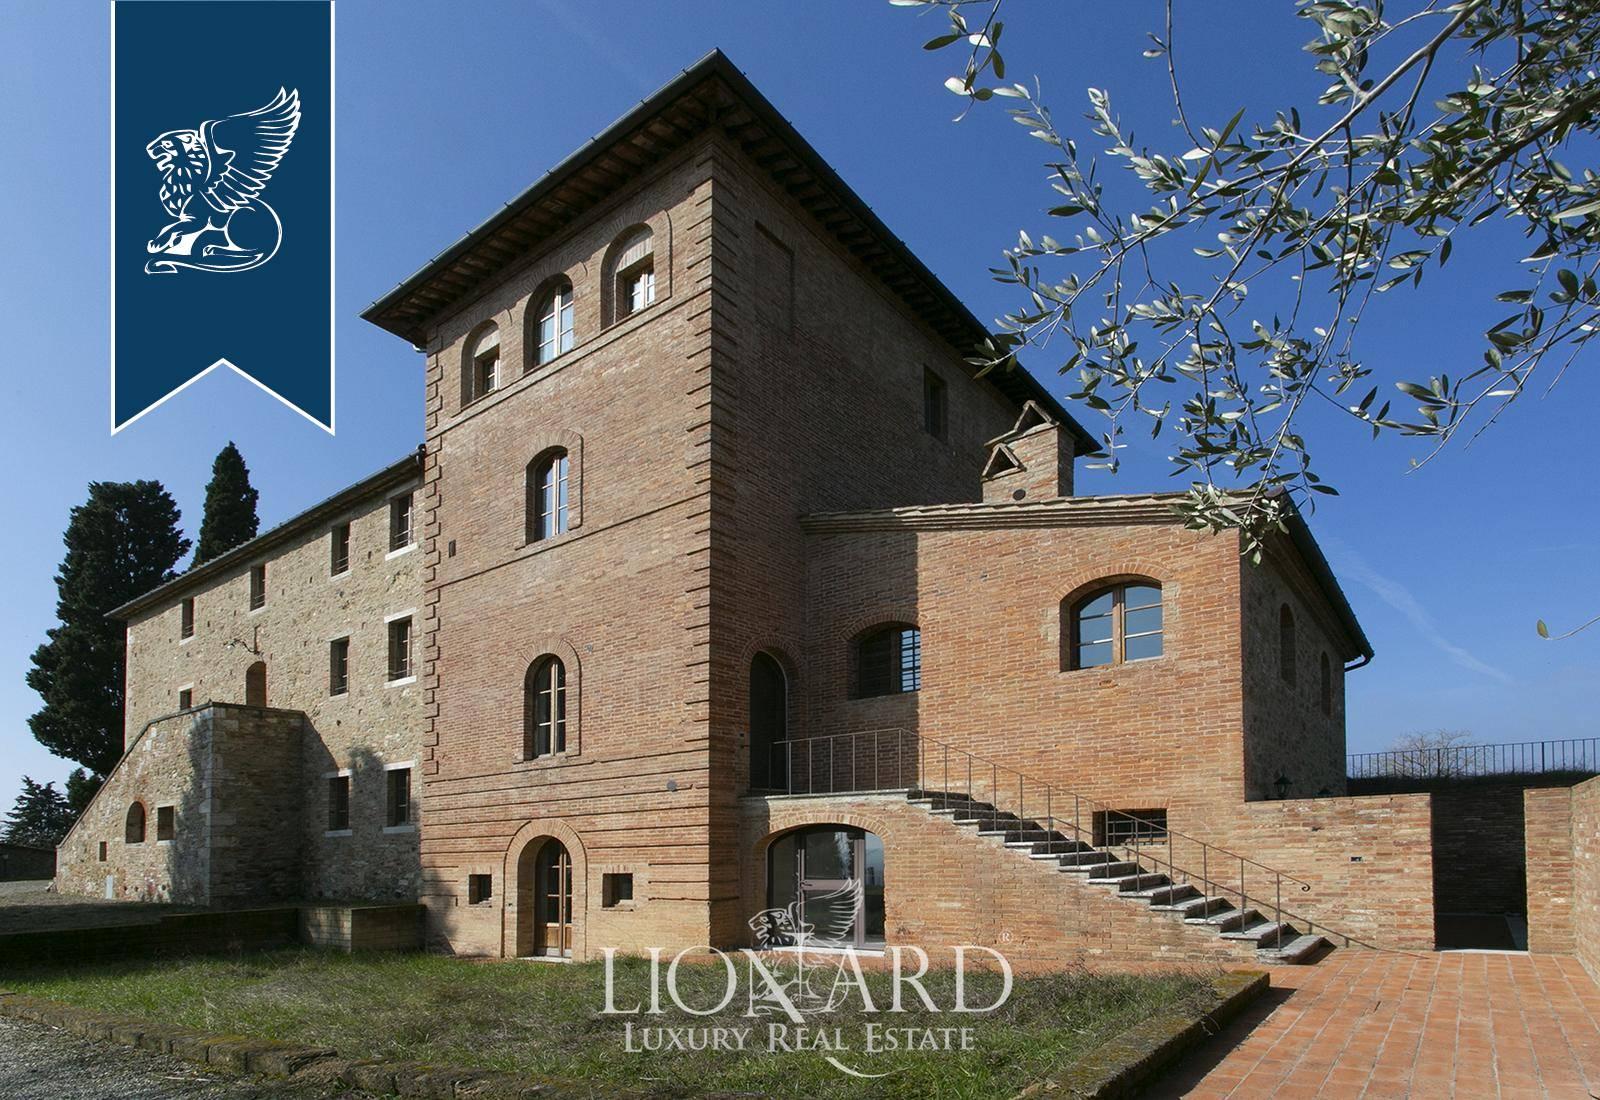 Agriturismo in Vendita a Castelnuovo Berardenga: 0 locali, 2500 mq - Foto 8